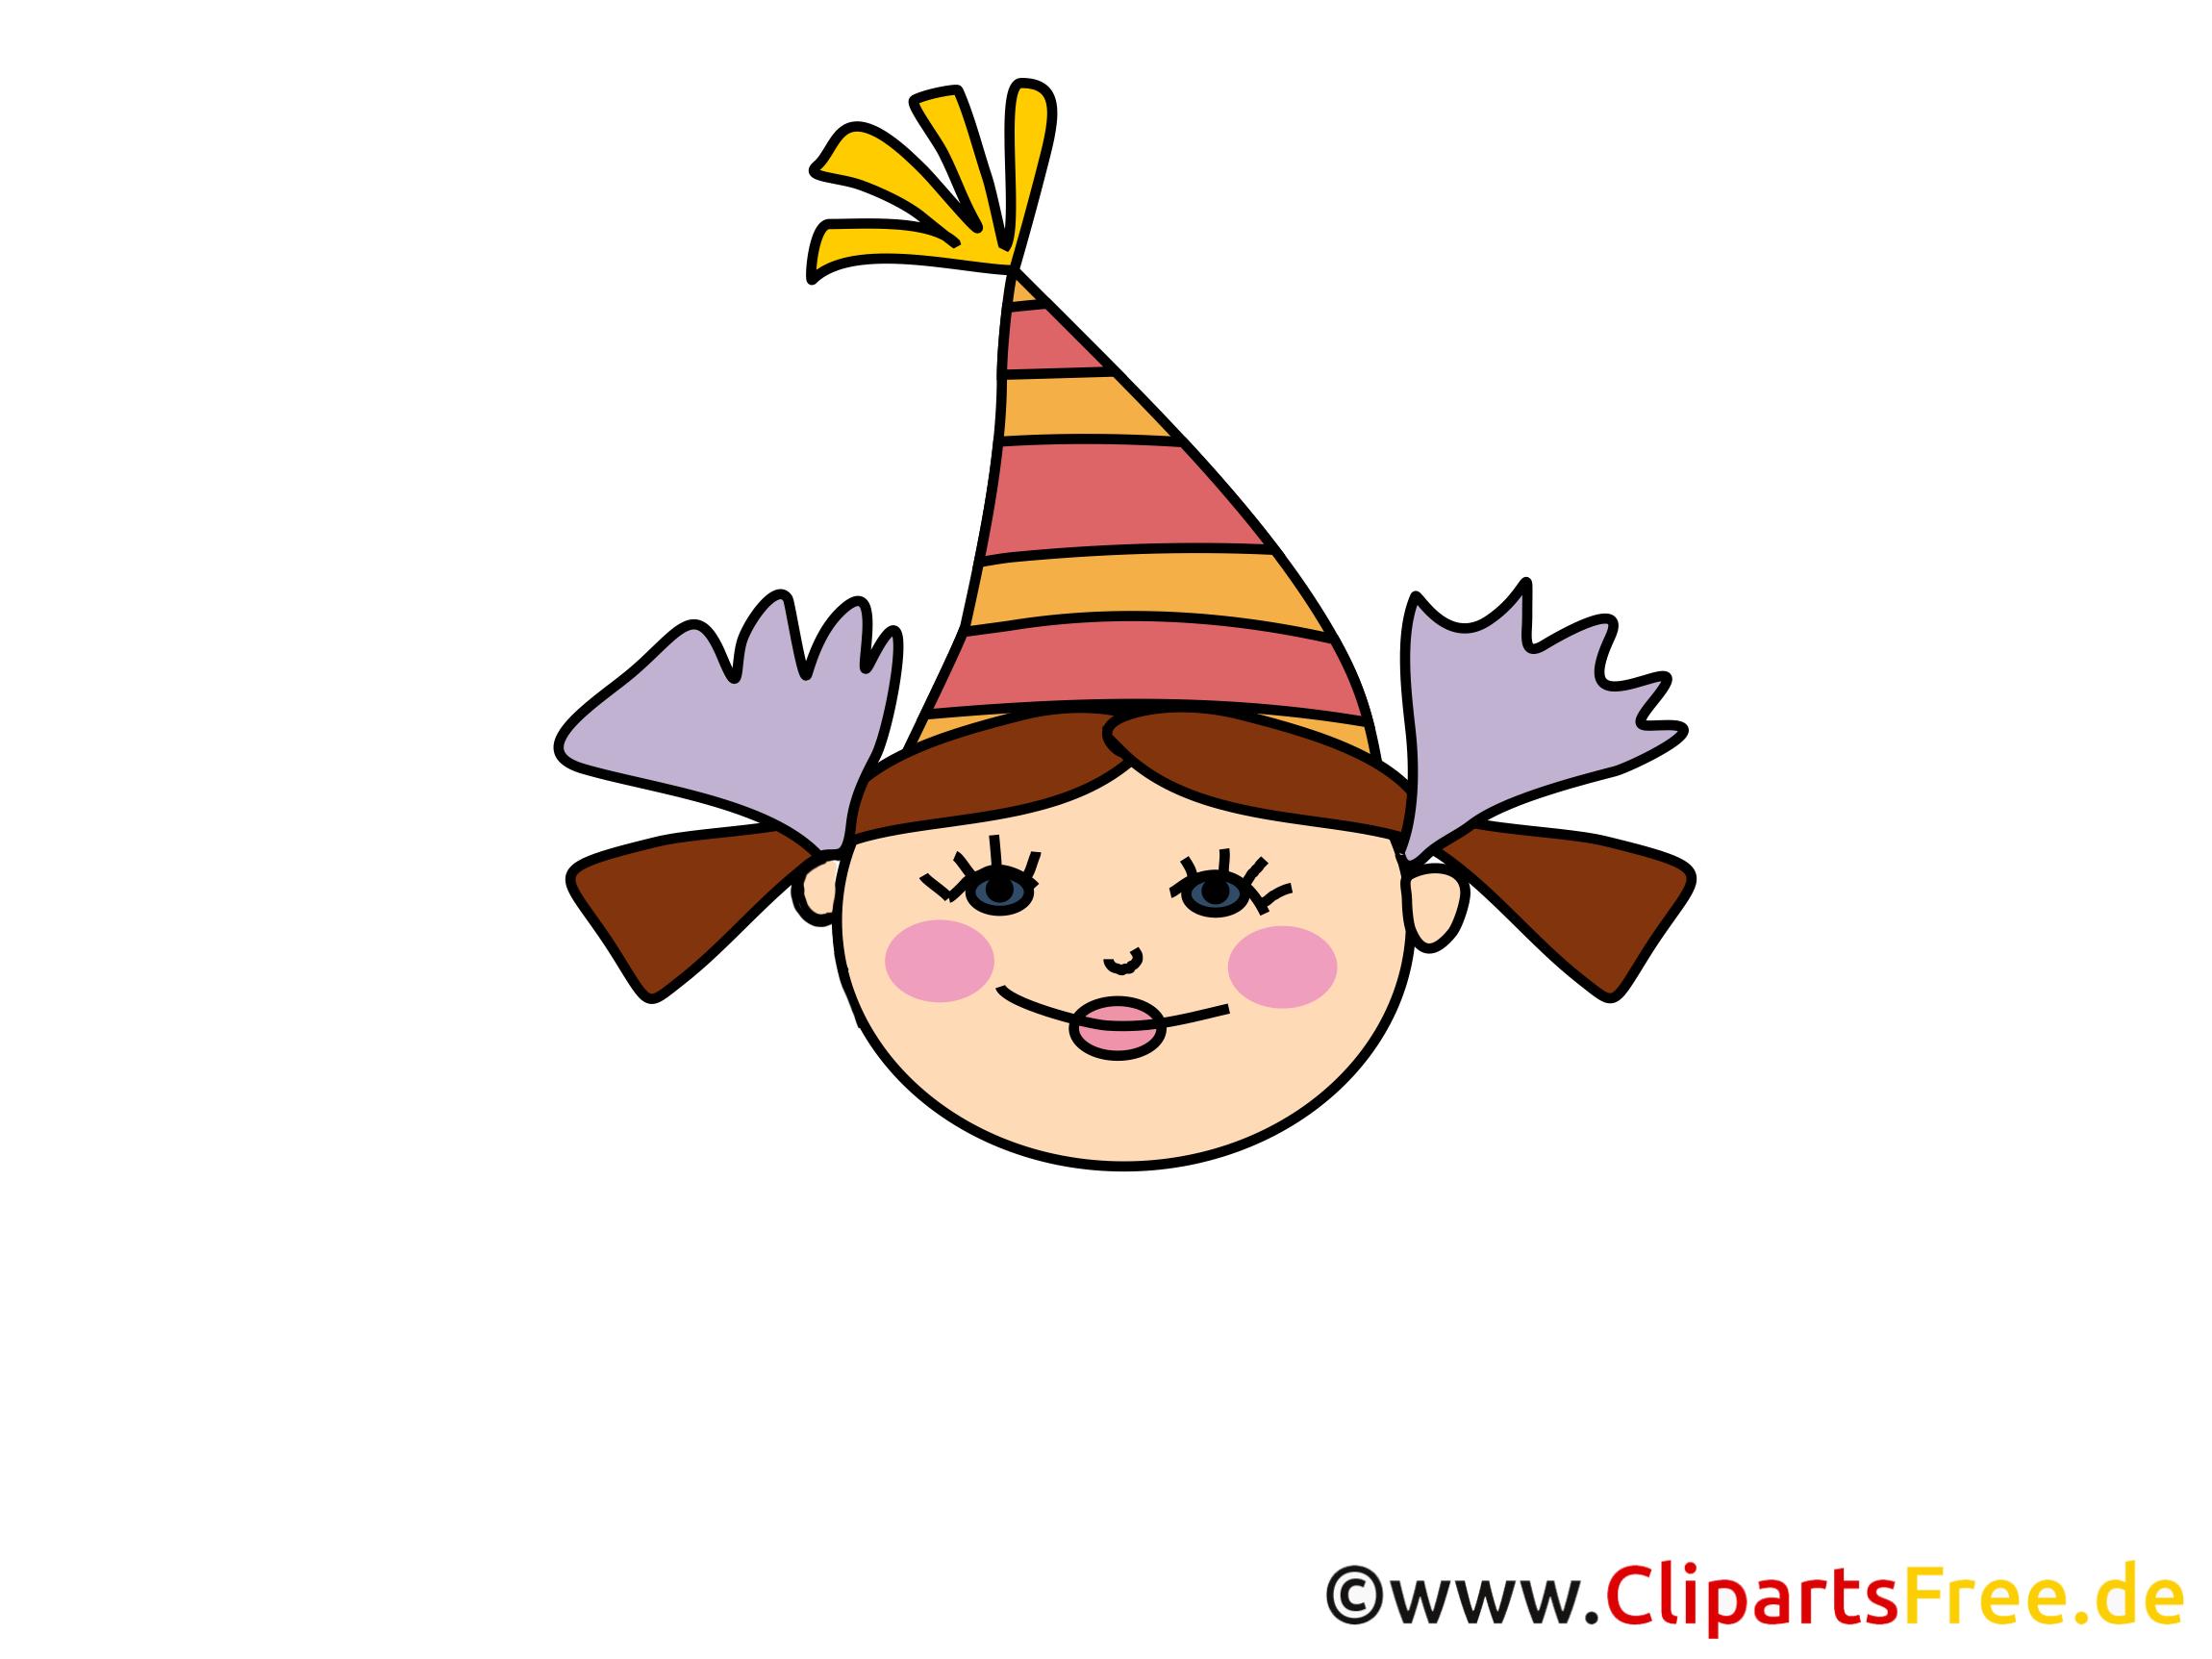 Clown dessins gratuits – Émoticônes clipart